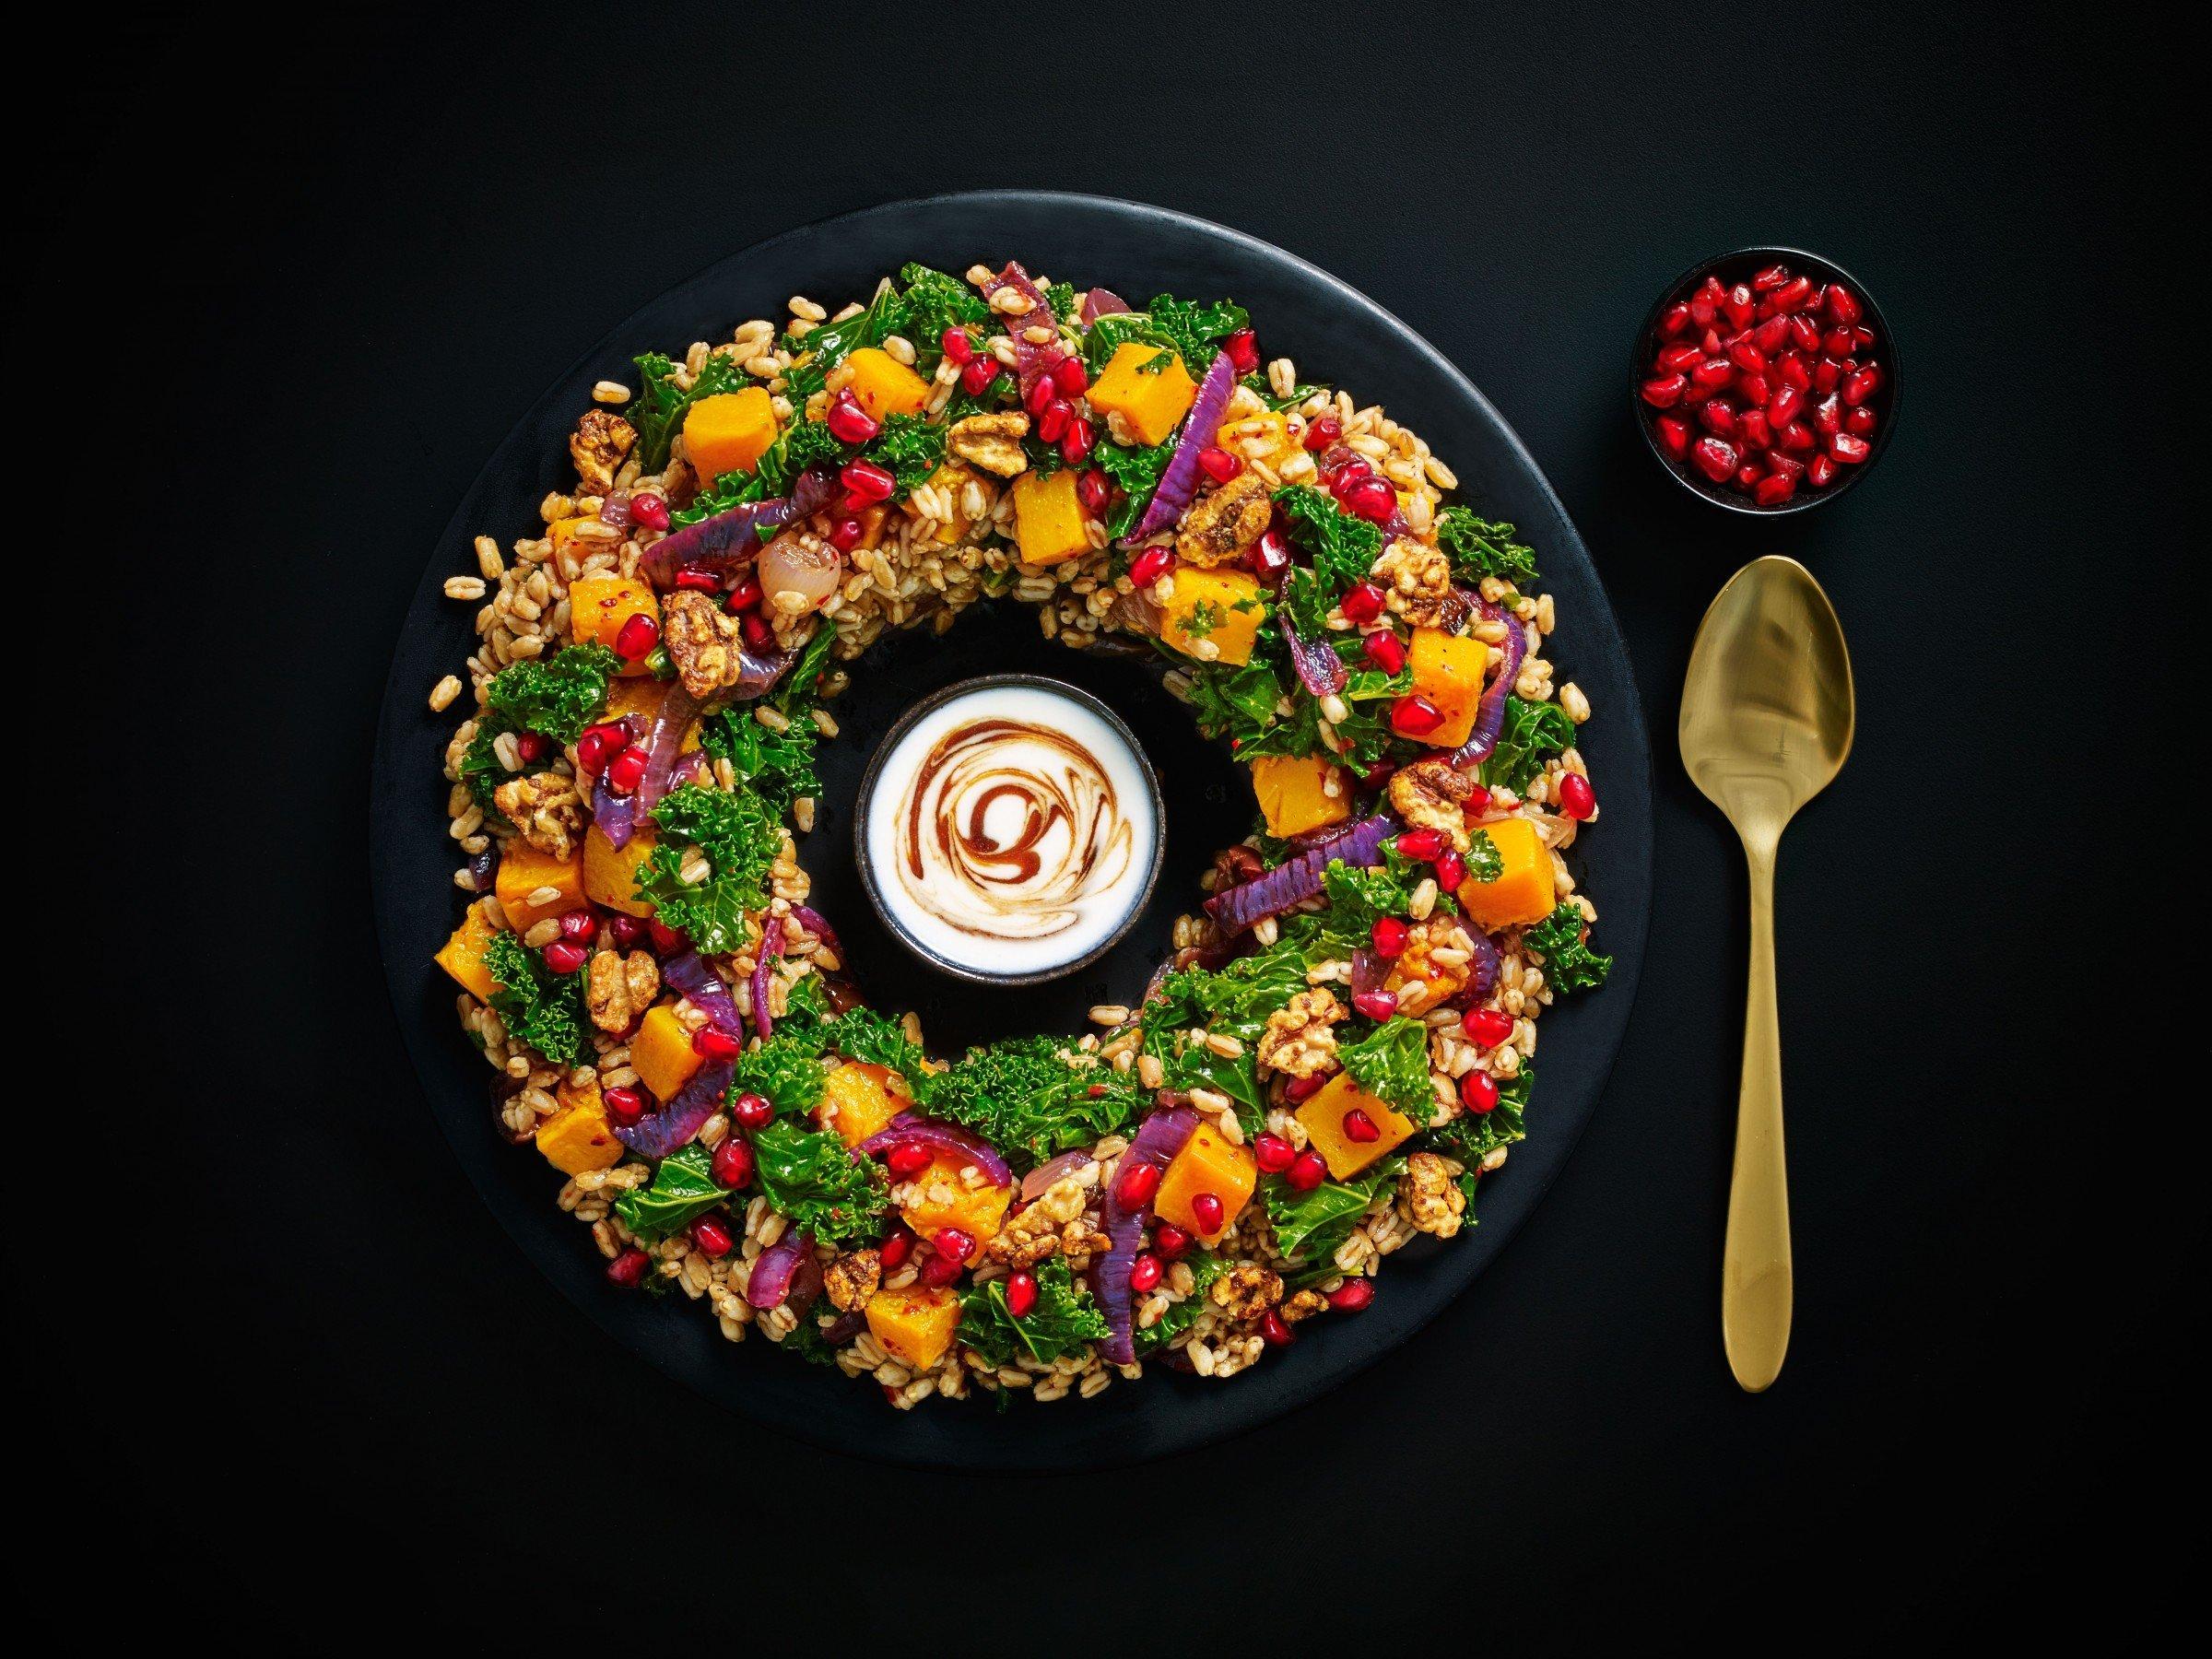 Festive Roast Squash Salad from M&S (2018)